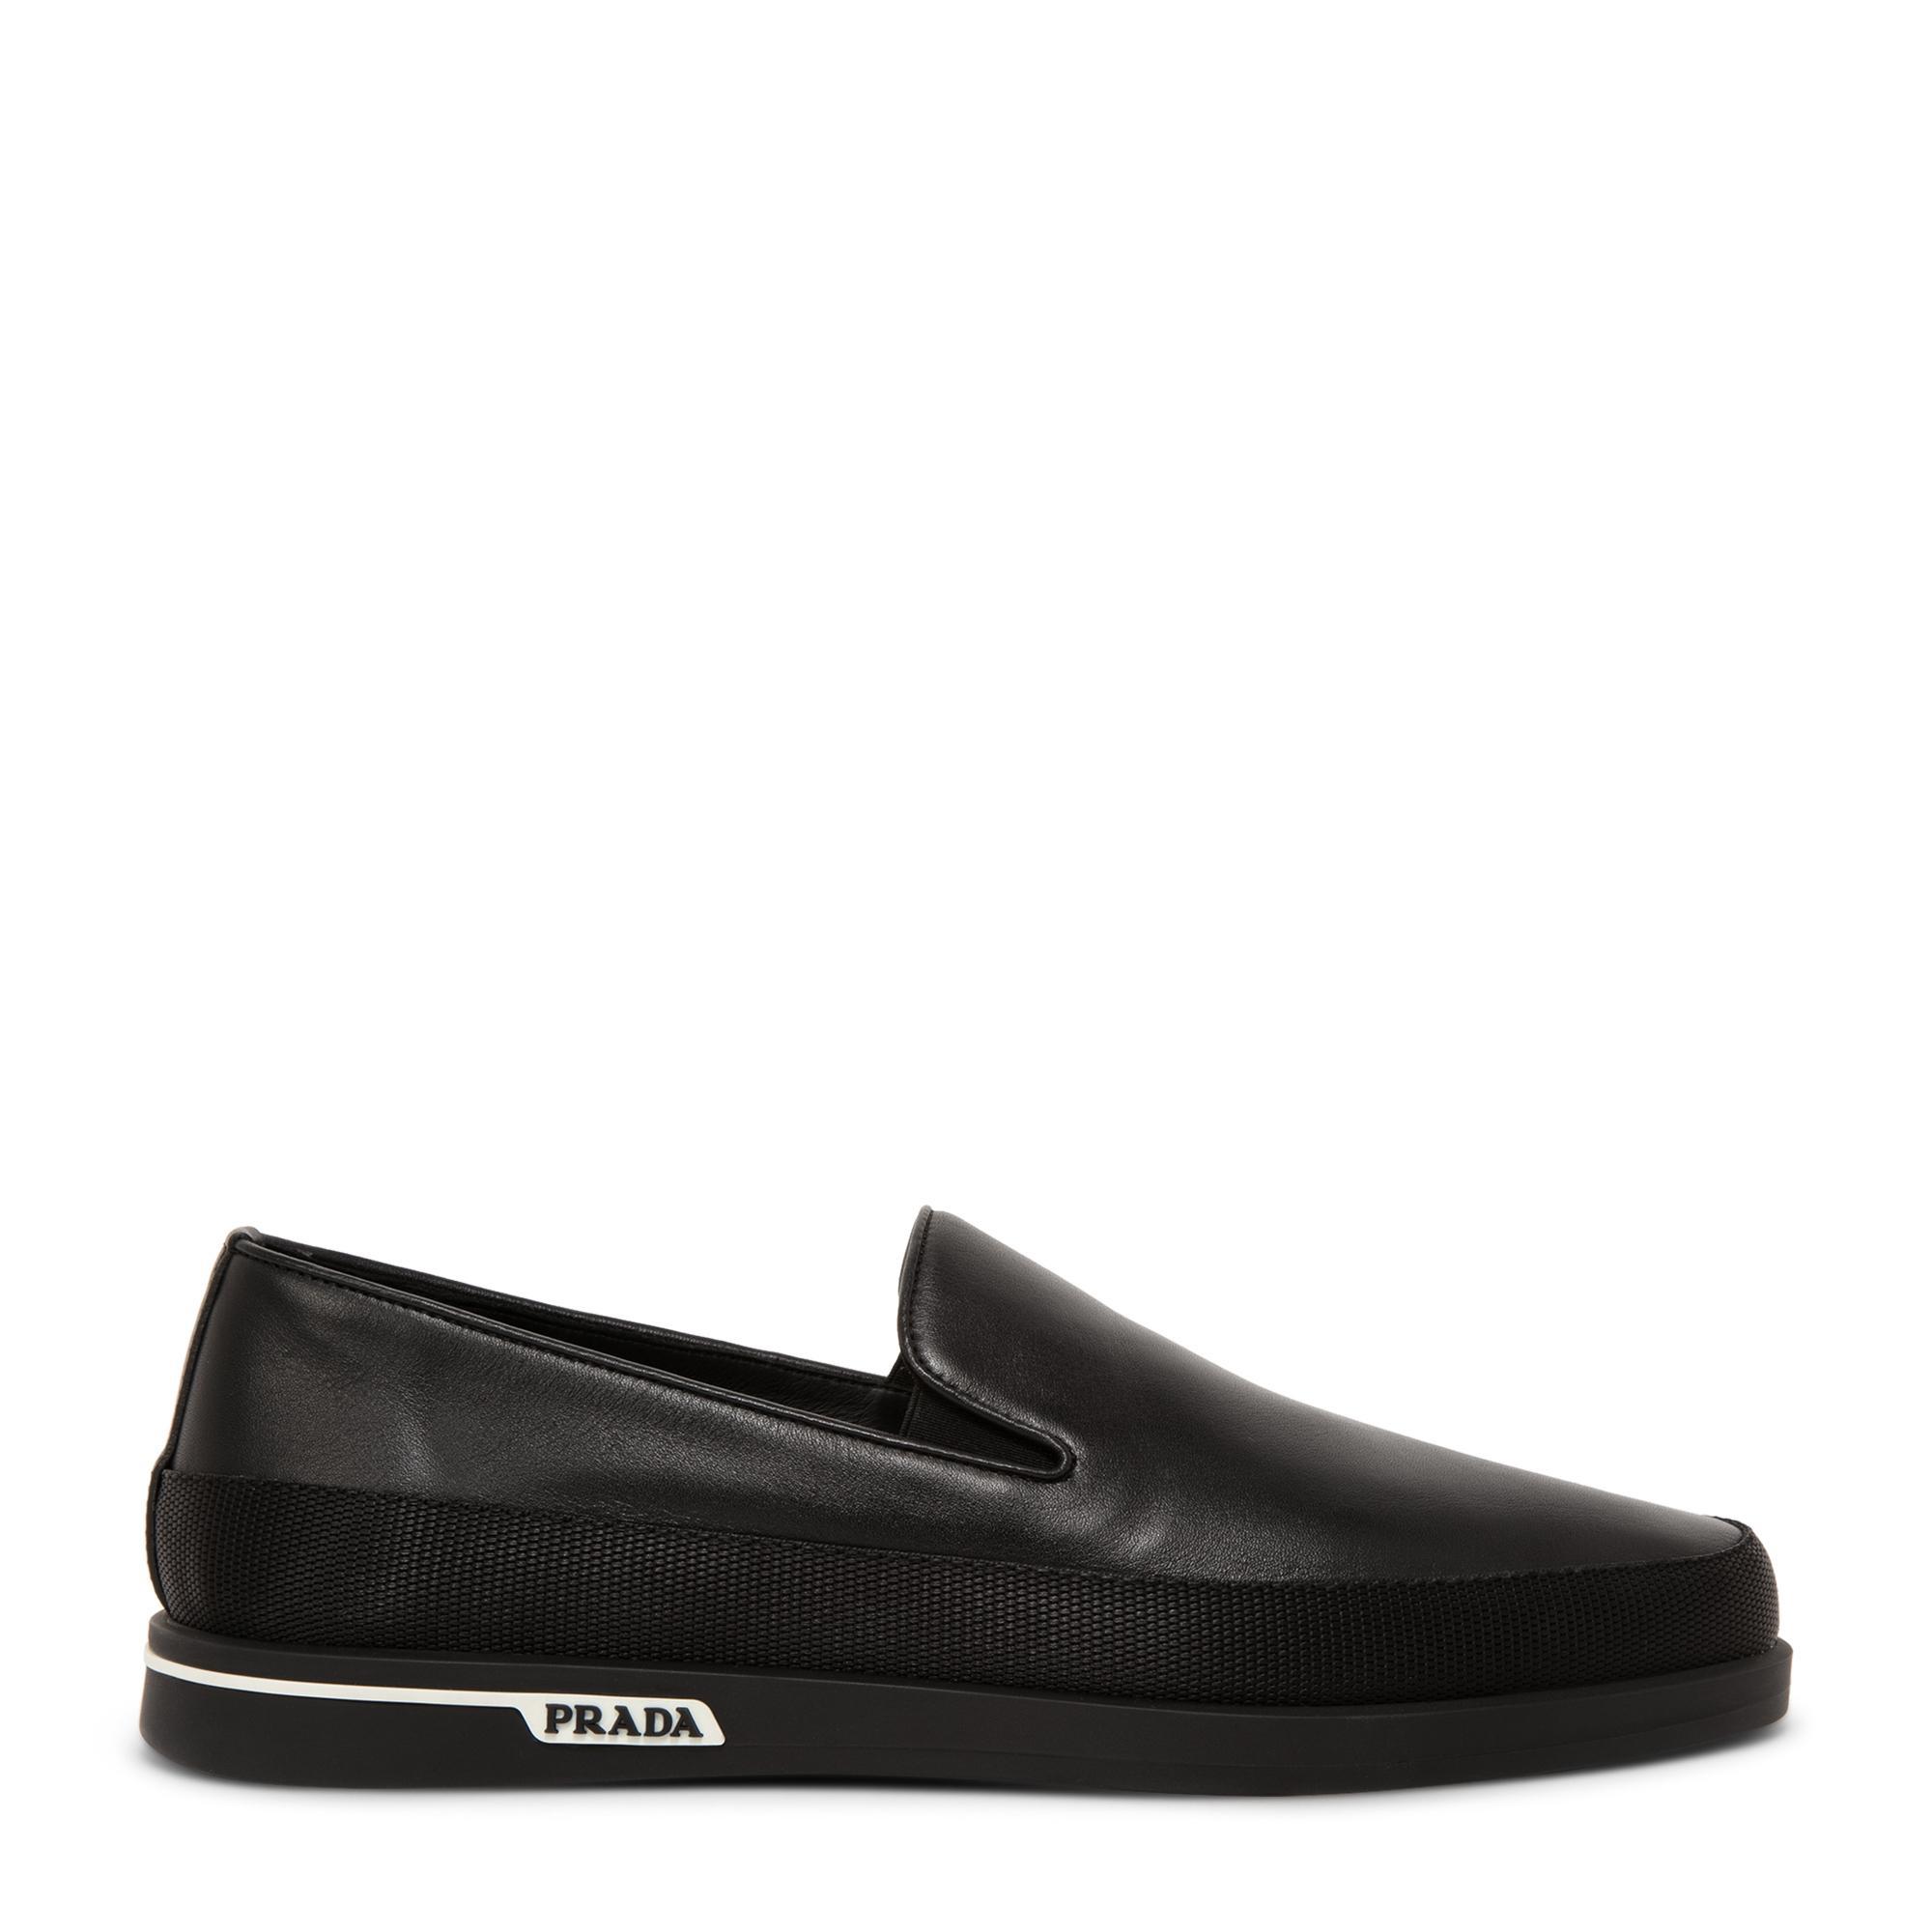 Saint Tropez leather slip-on sneakers